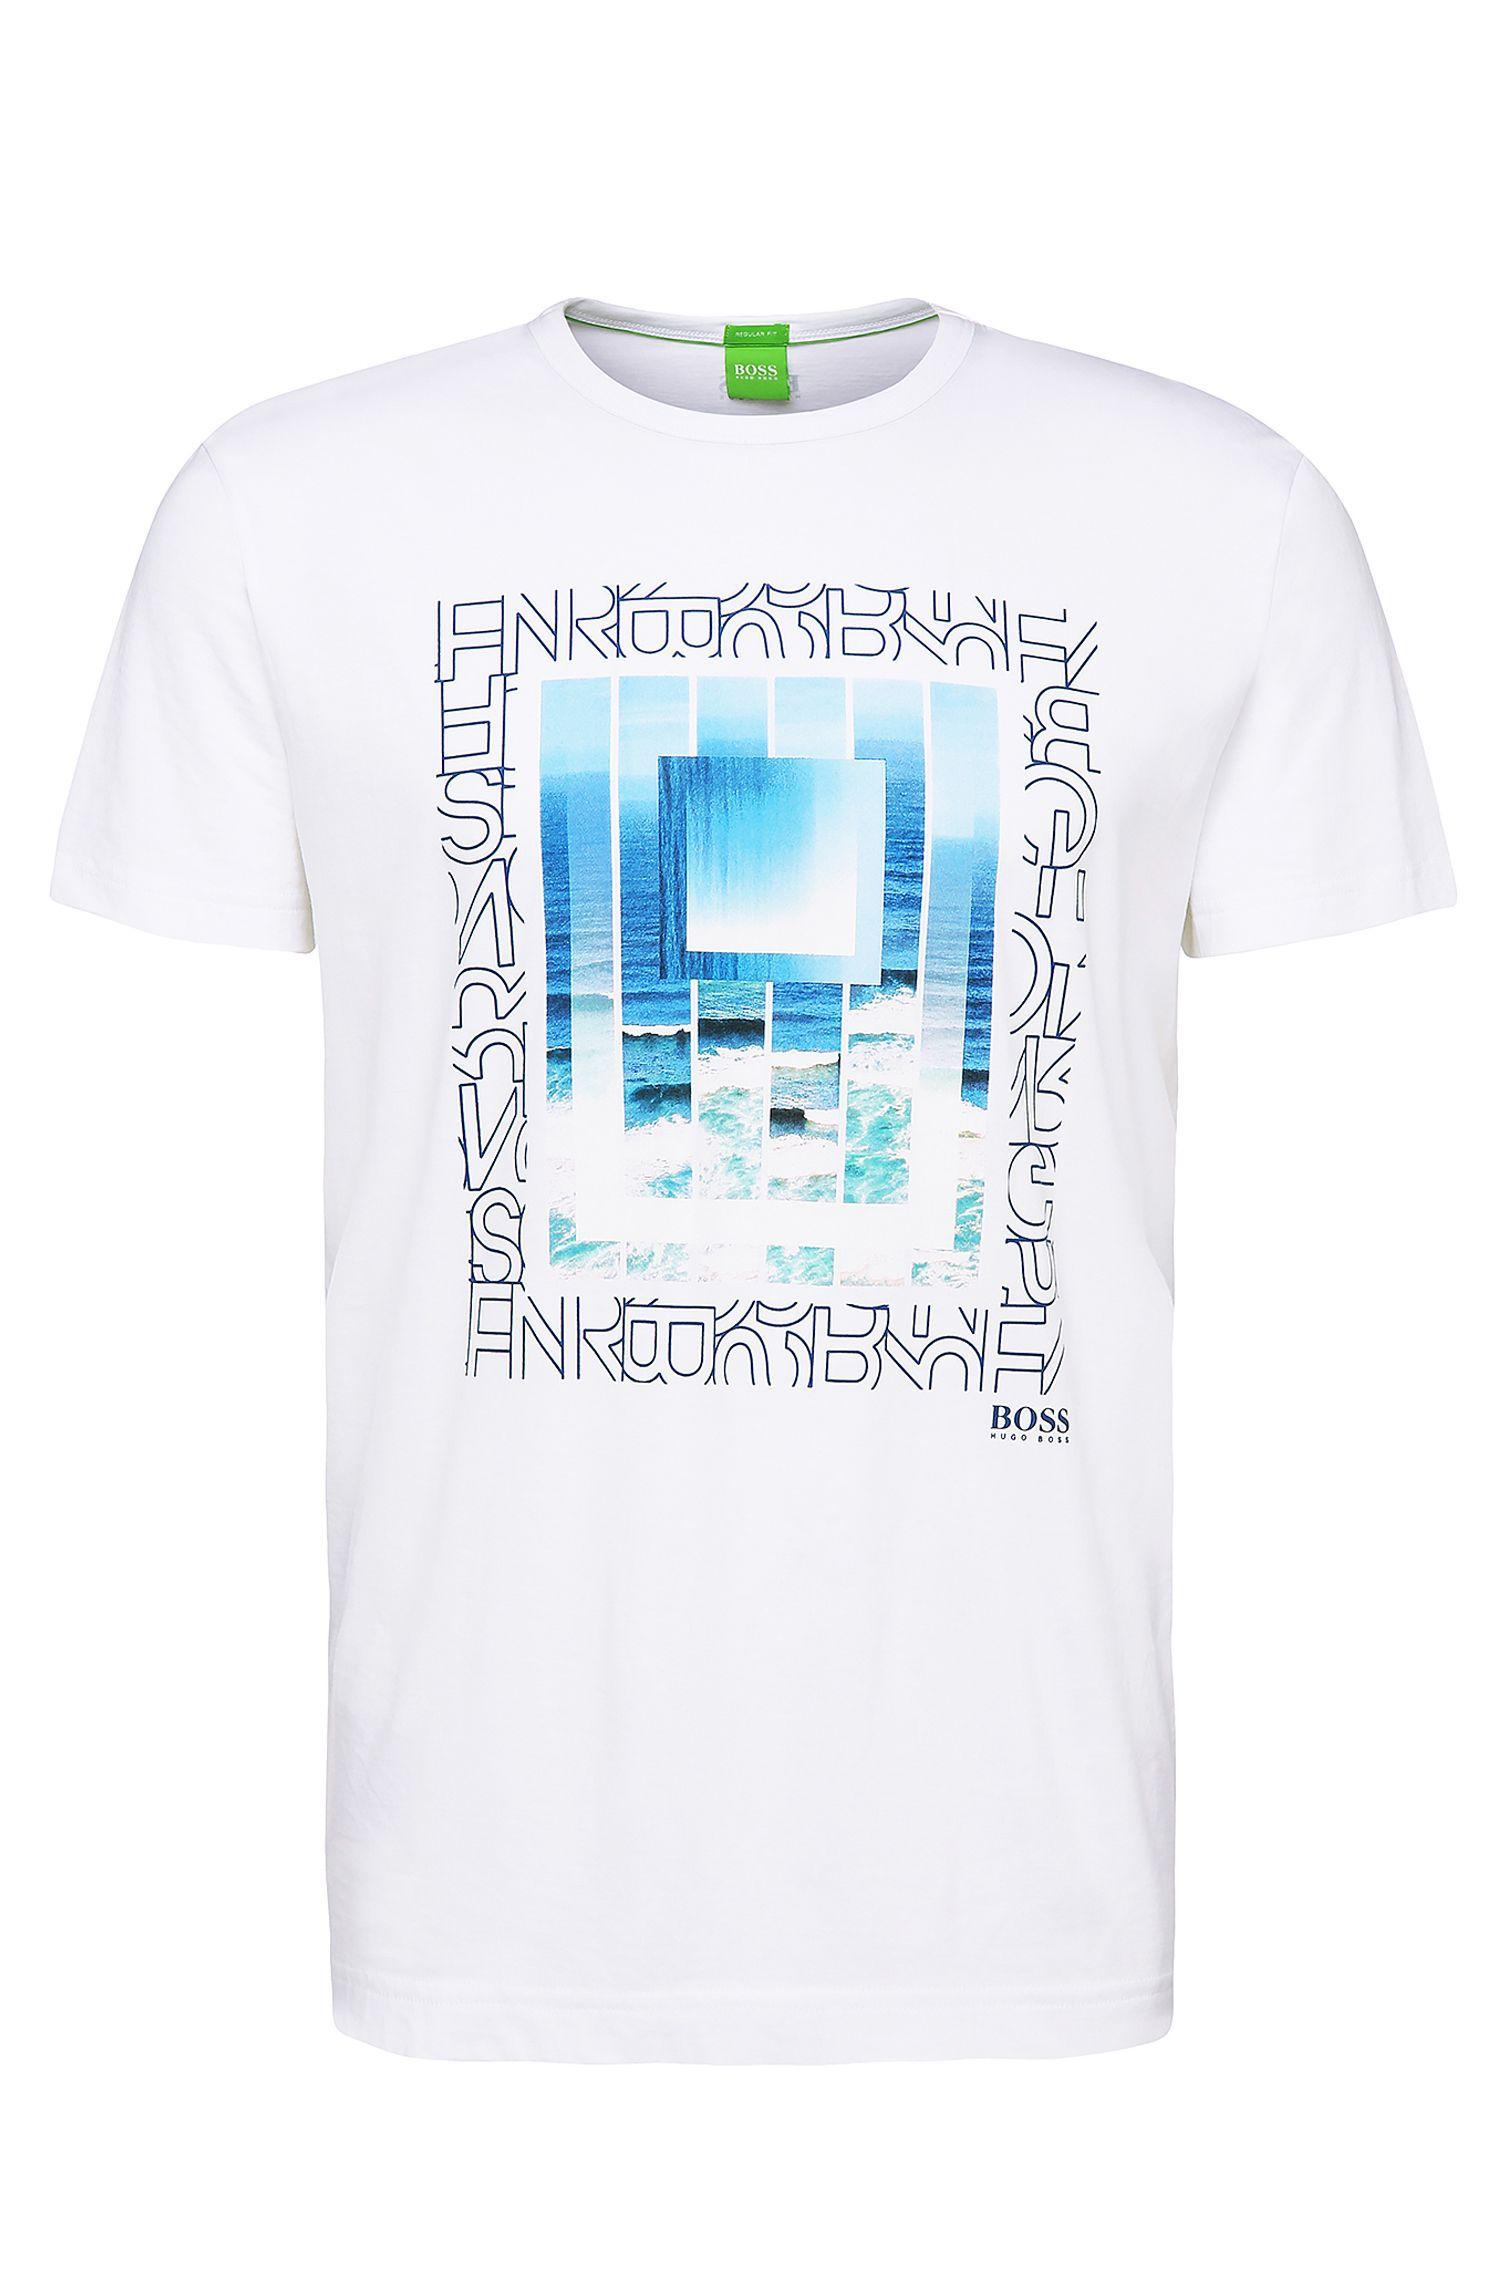 'Tee 5'   Cotton Printed T-Shirt